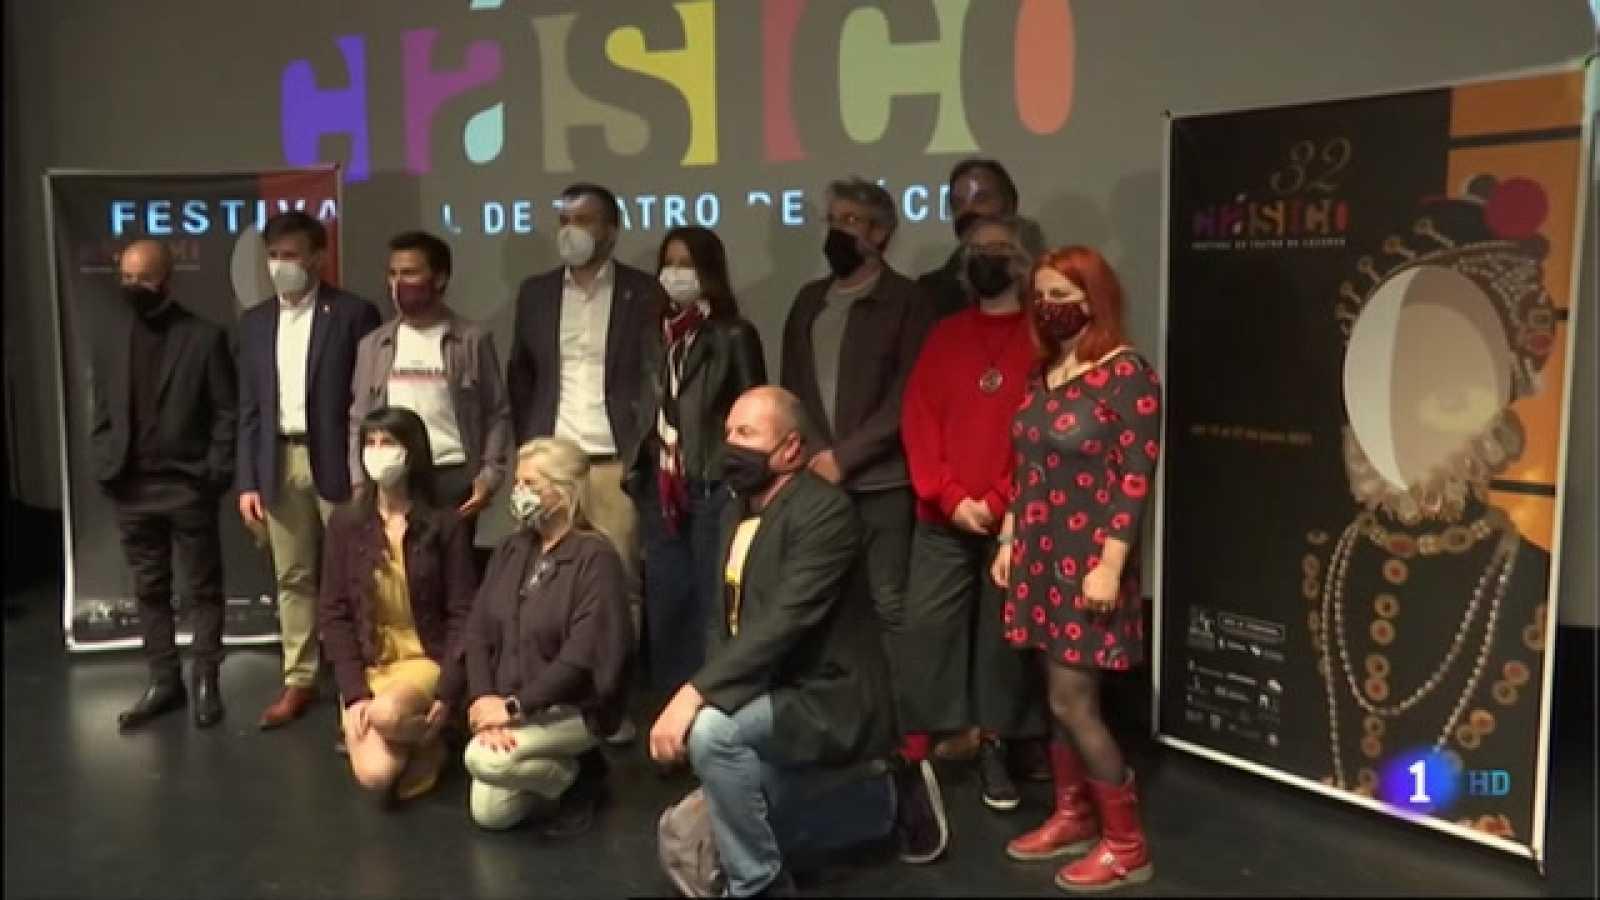 Festival de Teatro clásico de Cáceres - 21/04/2021